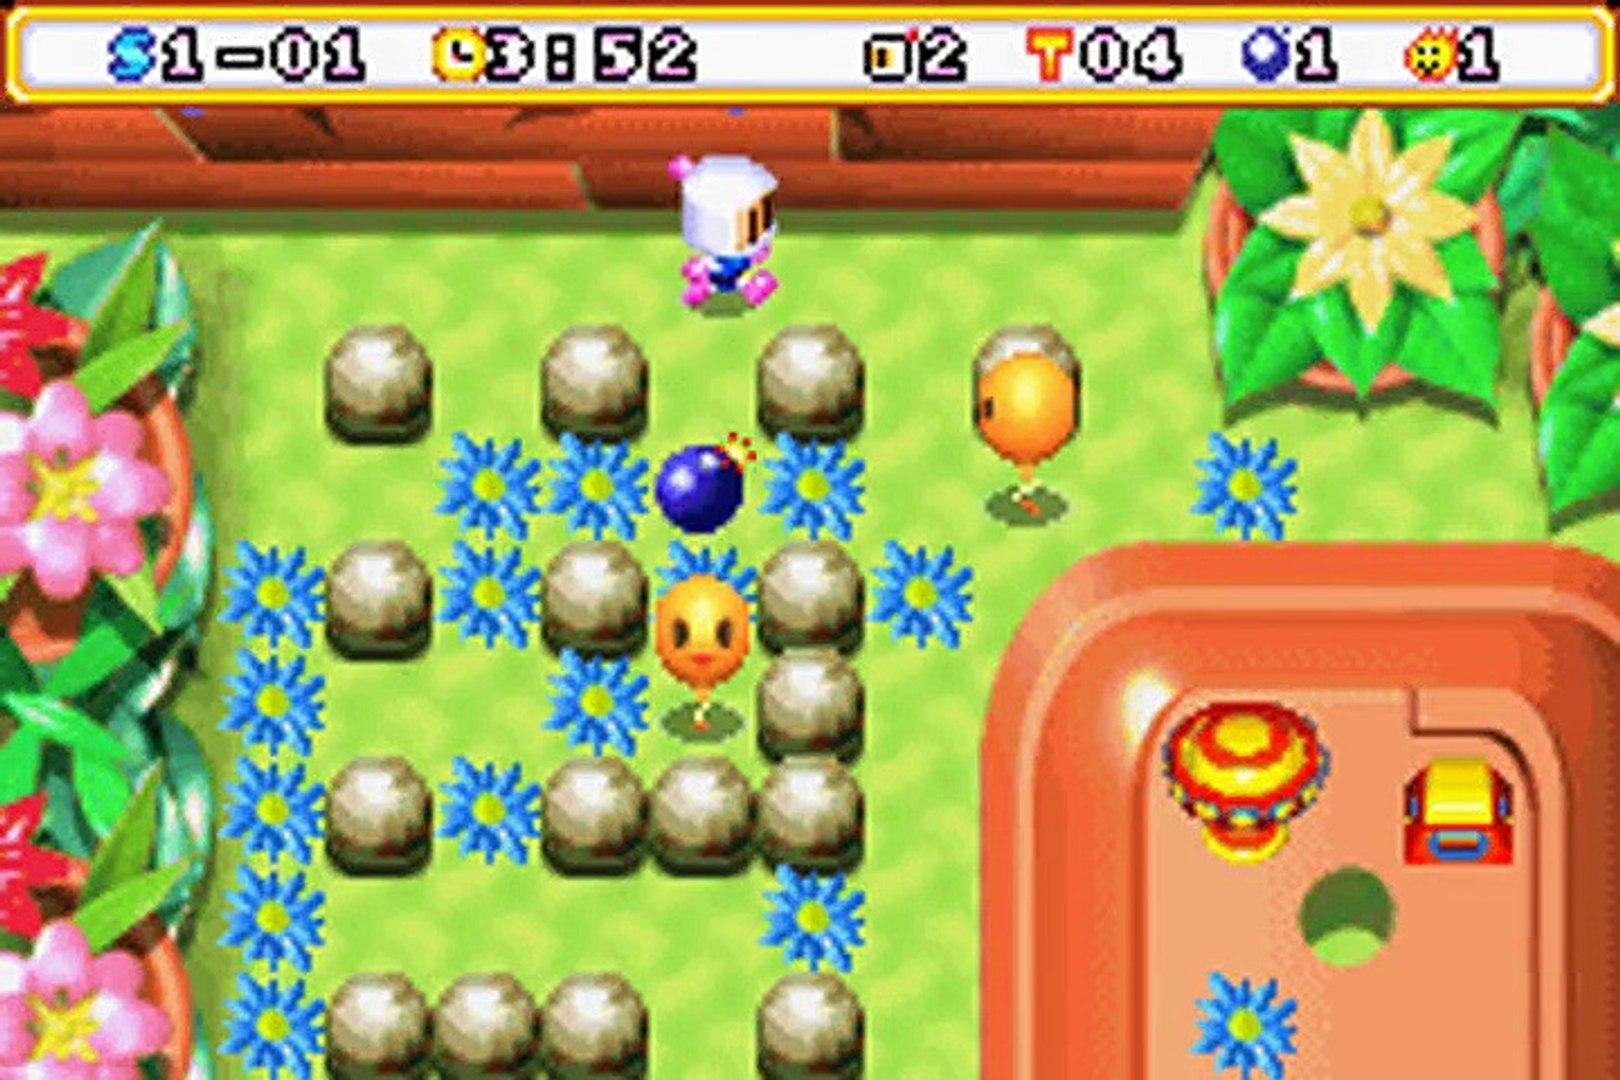 Bomberman Max 2 Blue Advance